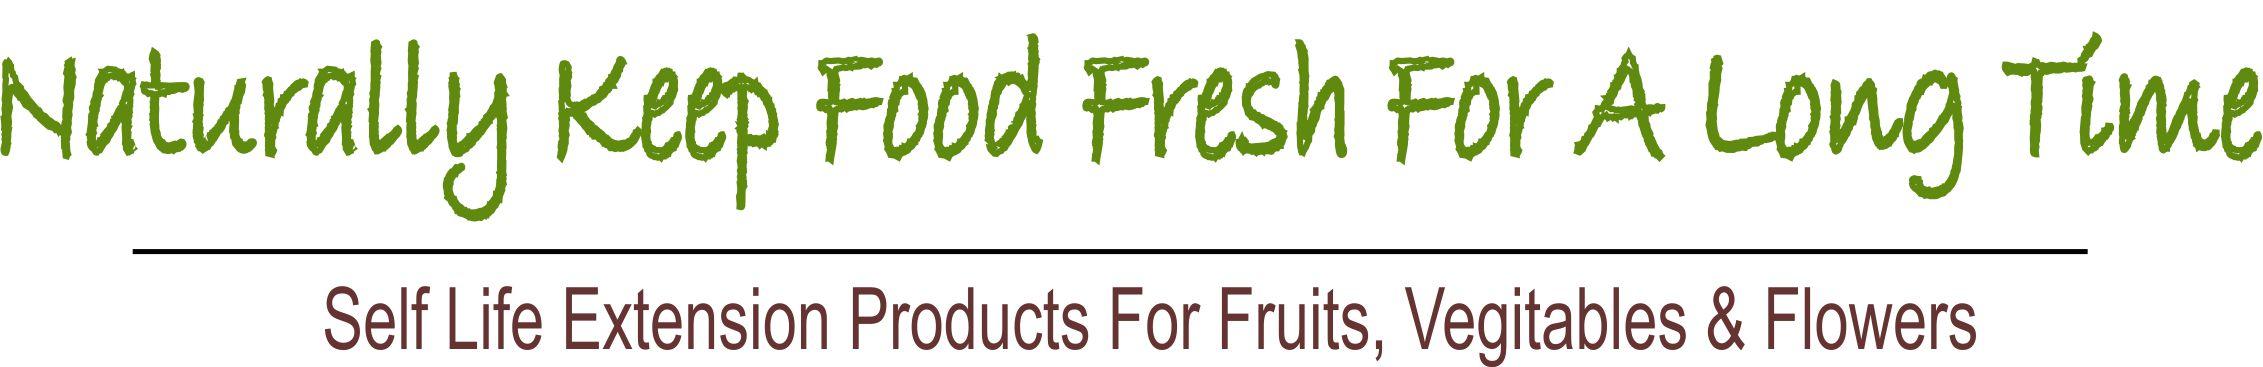 Keep fresh jpg